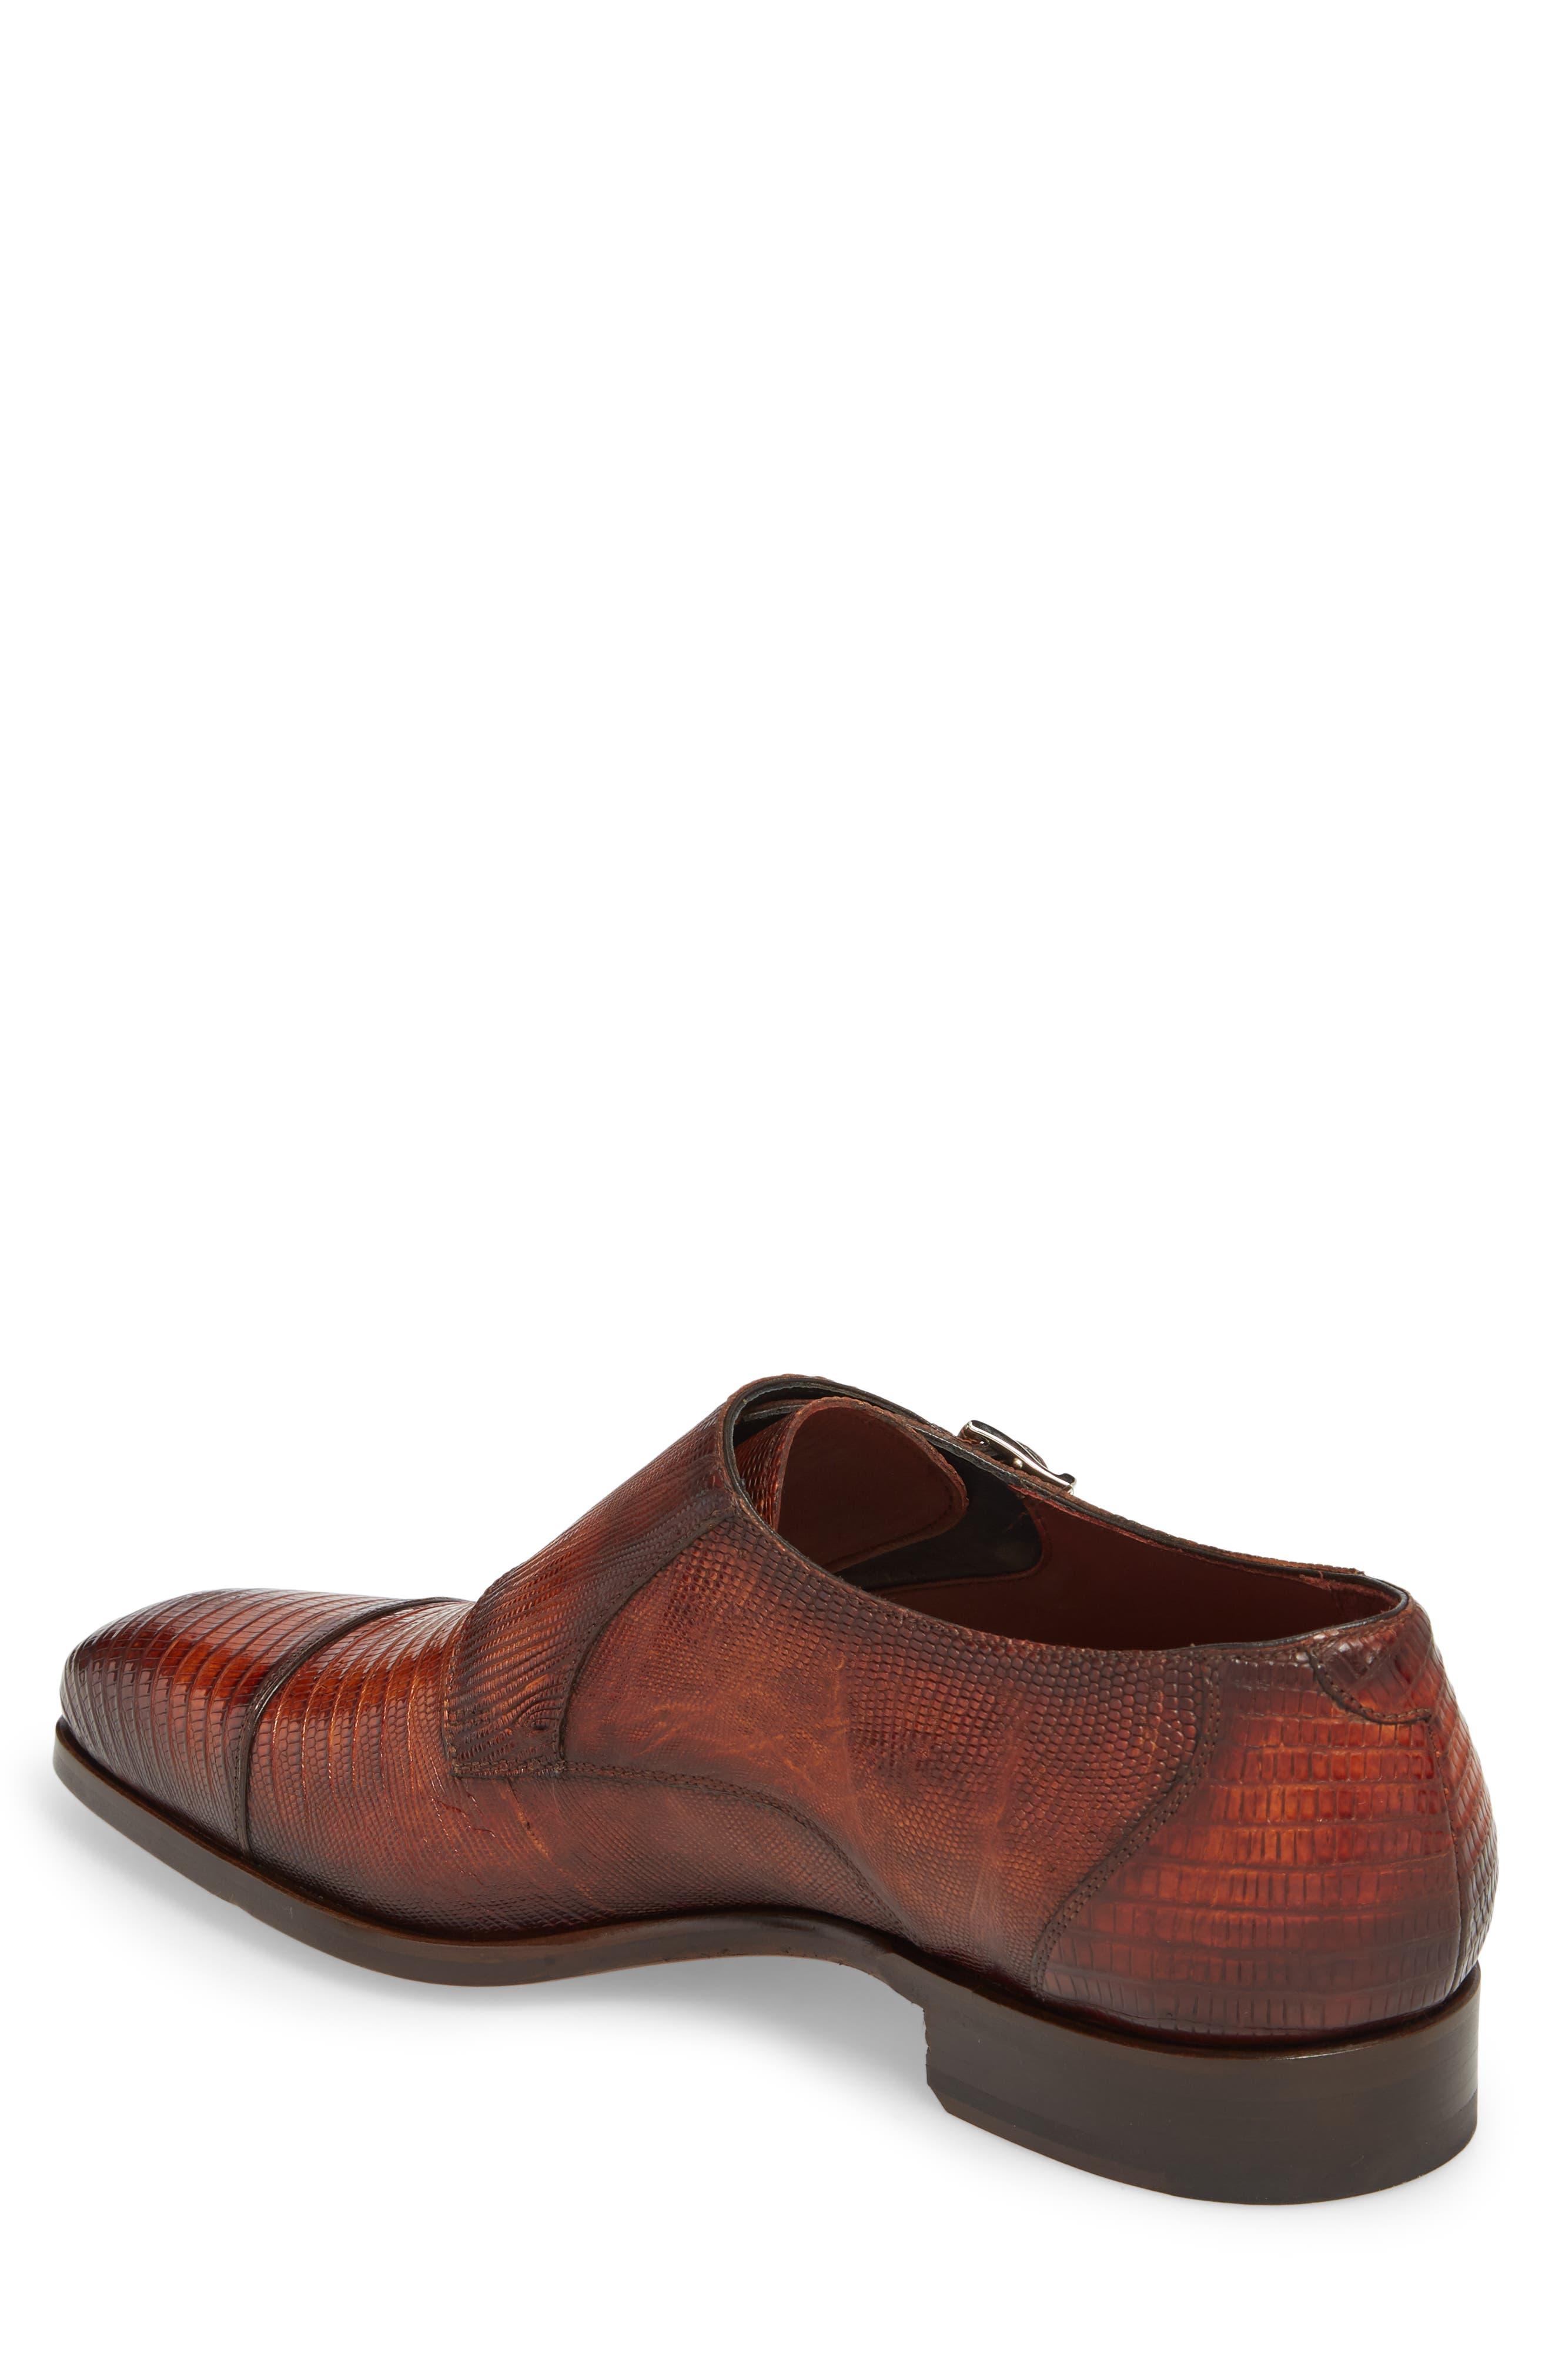 Isaac Cap Toe Monk Shoe,                             Alternate thumbnail 2, color,                             219